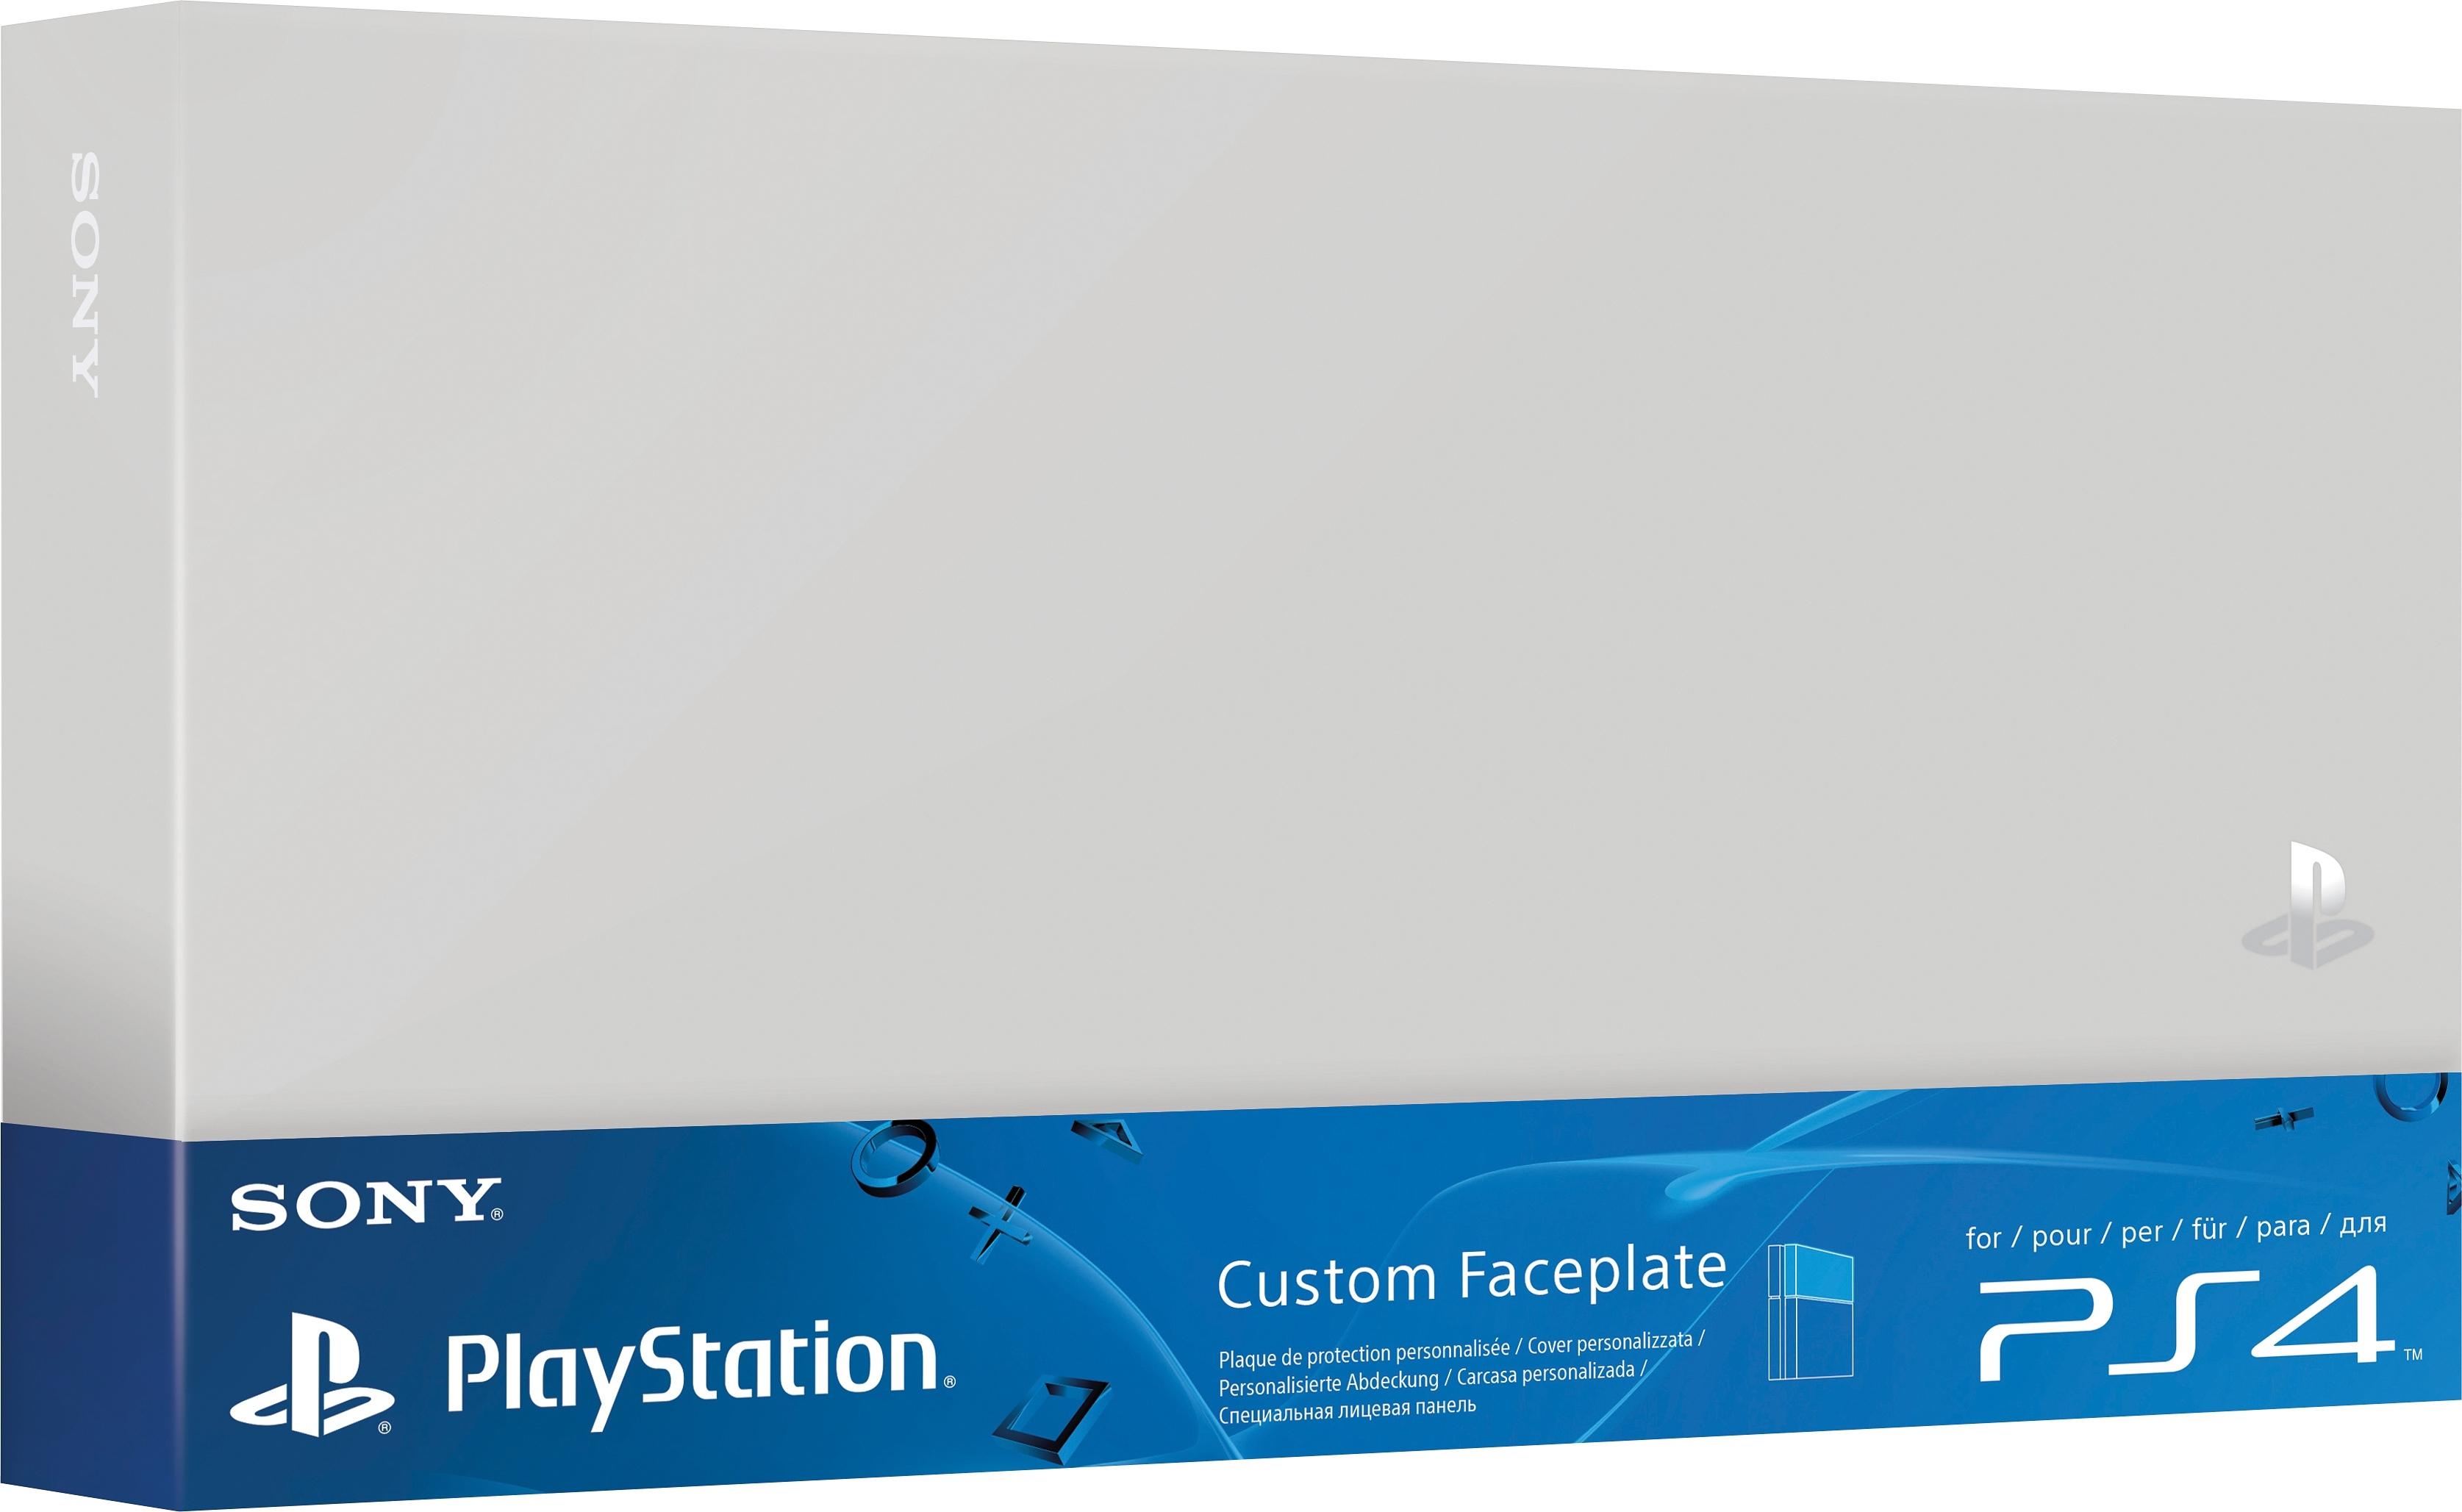 PlayStation 4 PS4-cover hoogte 10,85 cm - gratis ruilen op otto.nl